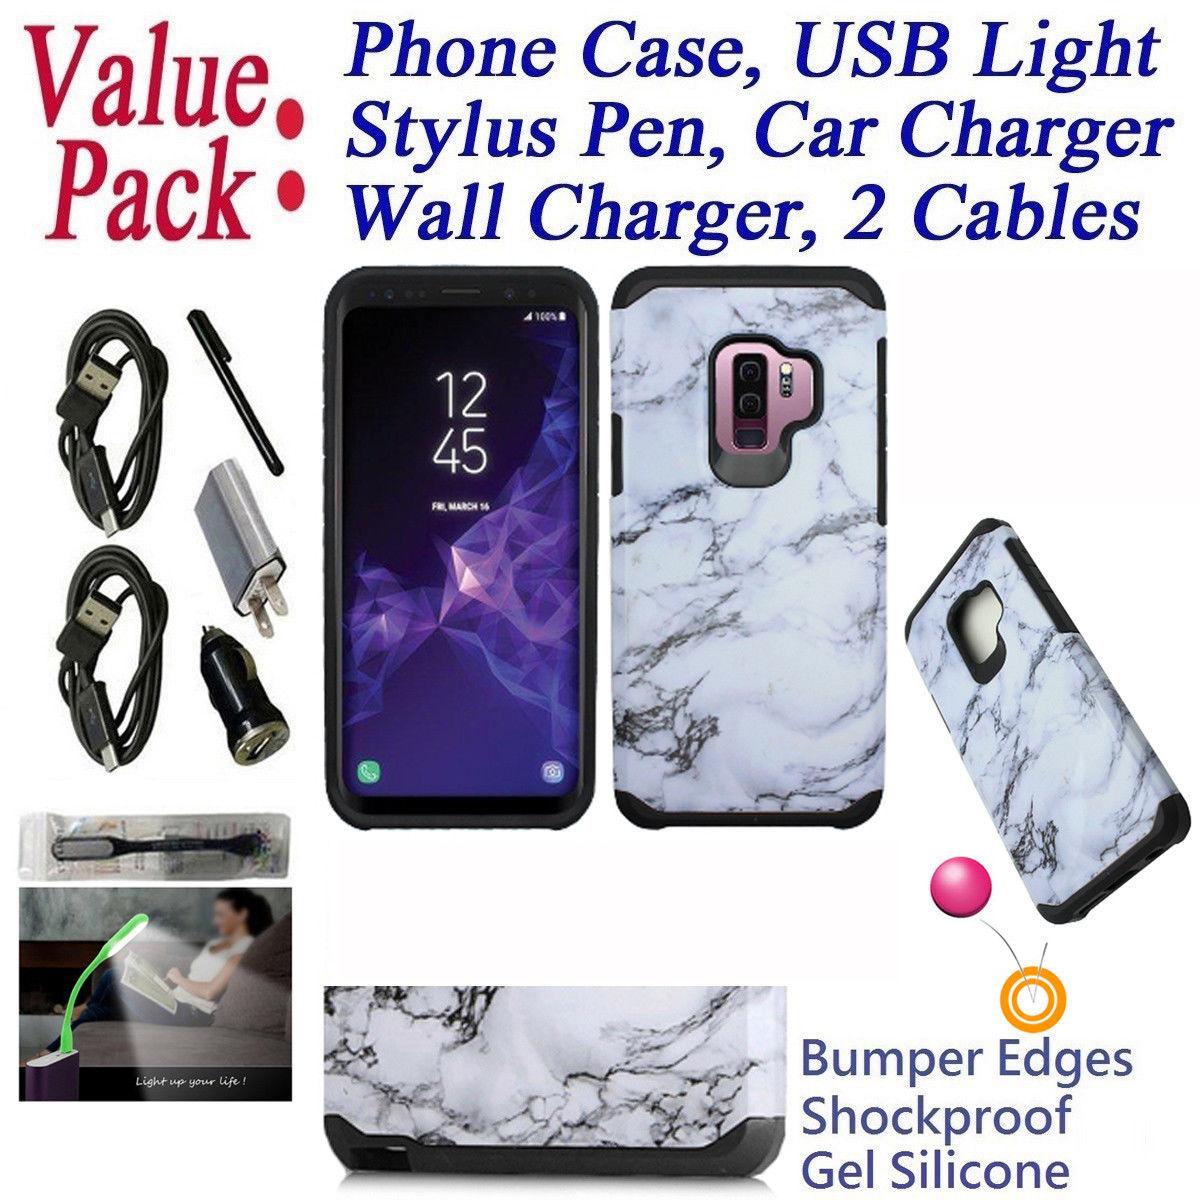 "Value Pack + for 6.2"" Samsung S9 + PLUS Galaxy S 9 + PLUS Case Hybrid Phone Case Shock proof Edges Drop Bumper Scratch Shield Slim Cover Emblem Neon"